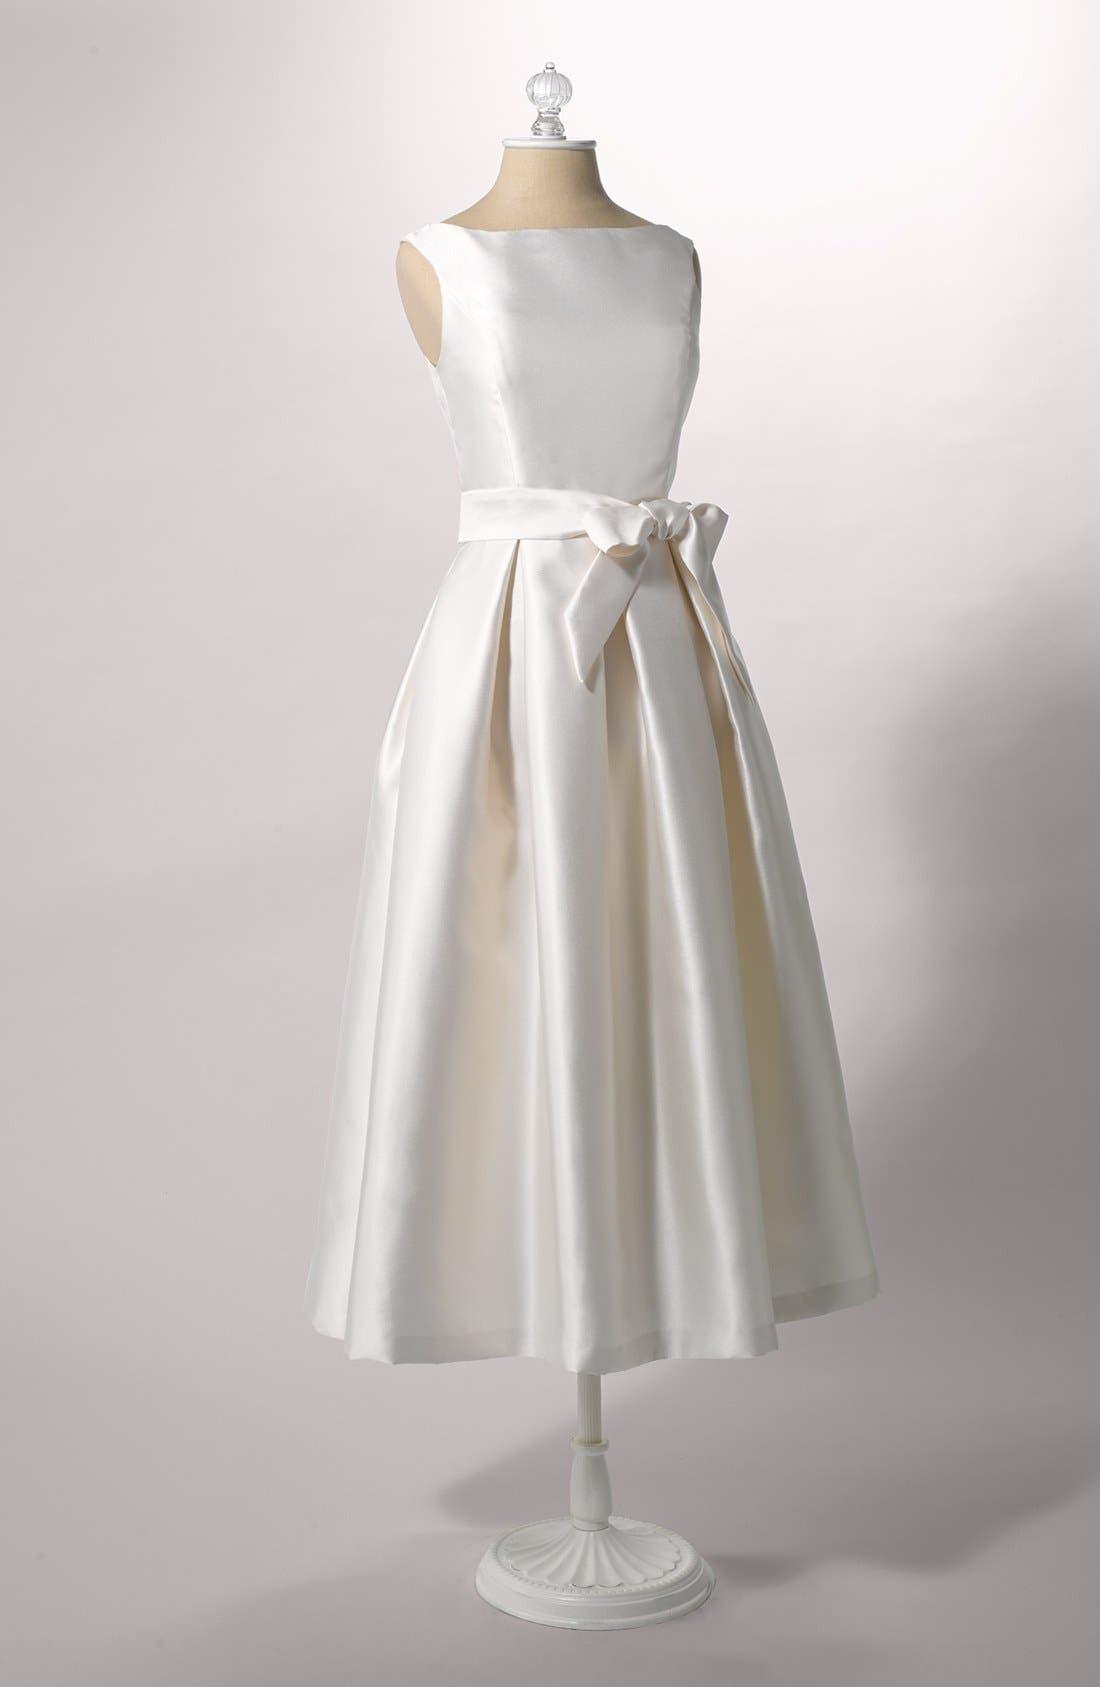 Faille Satin Fit & Flare Dress,                             Alternate thumbnail 5, color,                             900